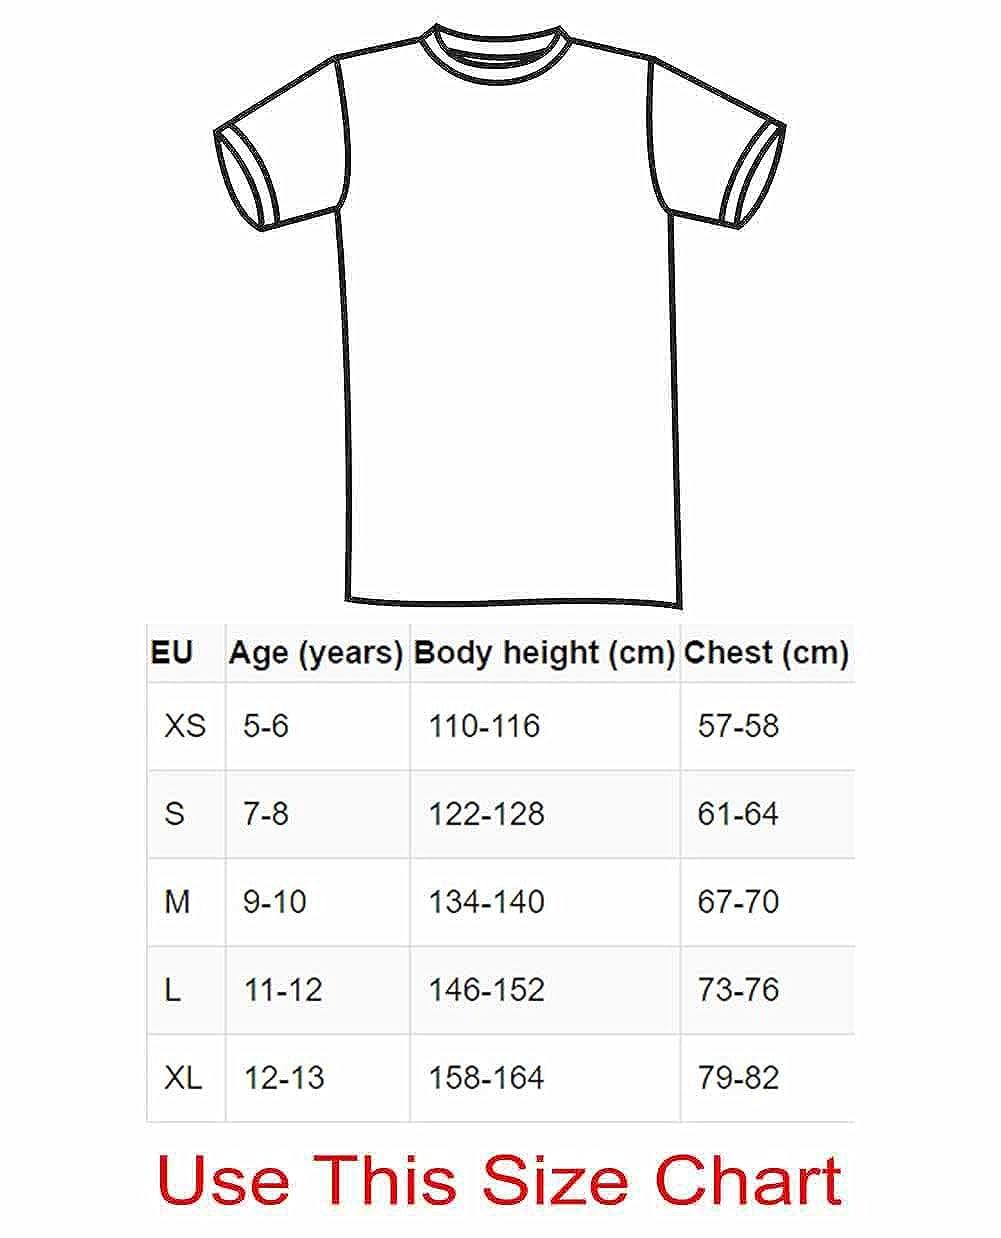 Camisetas Hombre Tirantes Gym Overdose Moda Hombre 2019 Sale Blusa Basicas Originales USA Bandera Sport Fitness Tops Tallas Grandes Camisetas Sin Mangas Hombre con Capucha